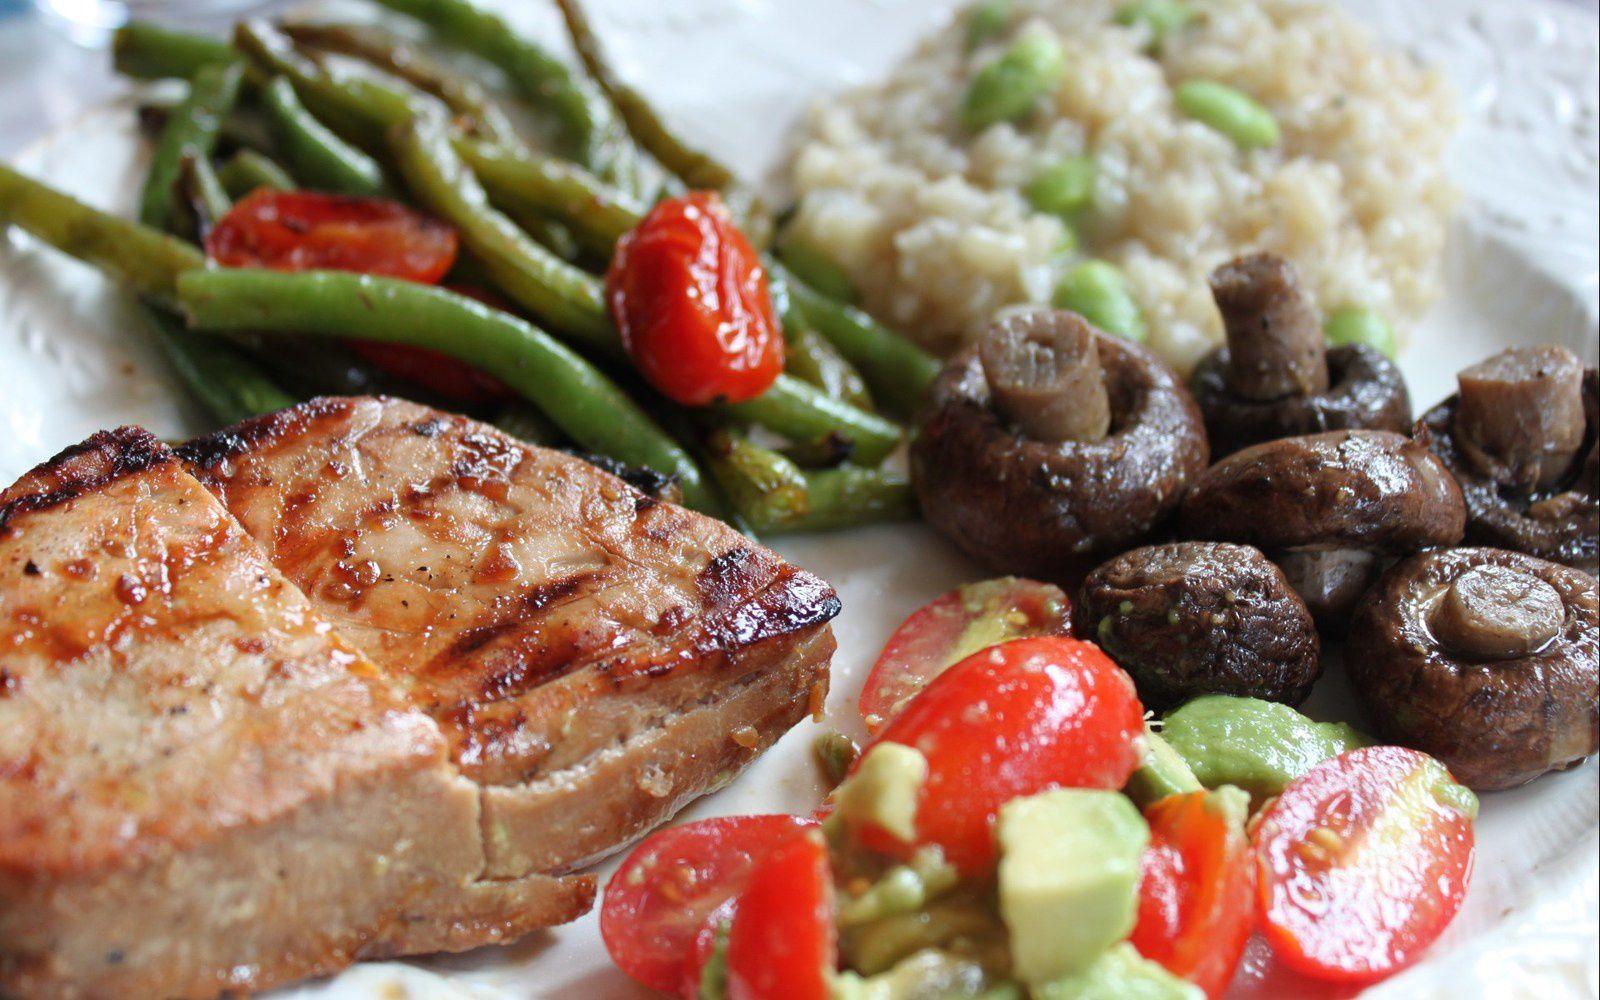 Bon appétit - Viande - Légumes - Wallpaper - Free